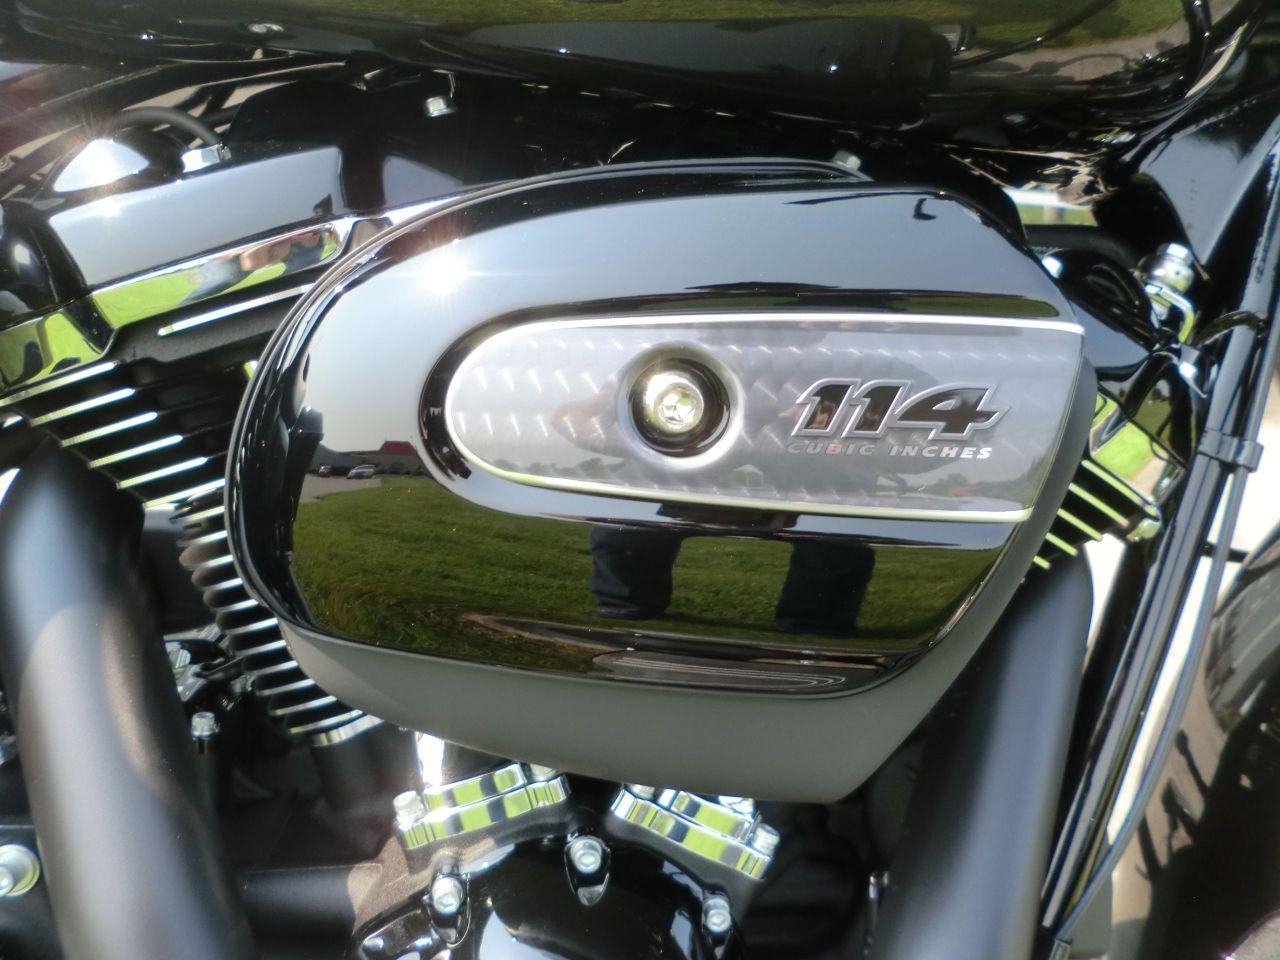 2019 Harley-Davidson FLHXS